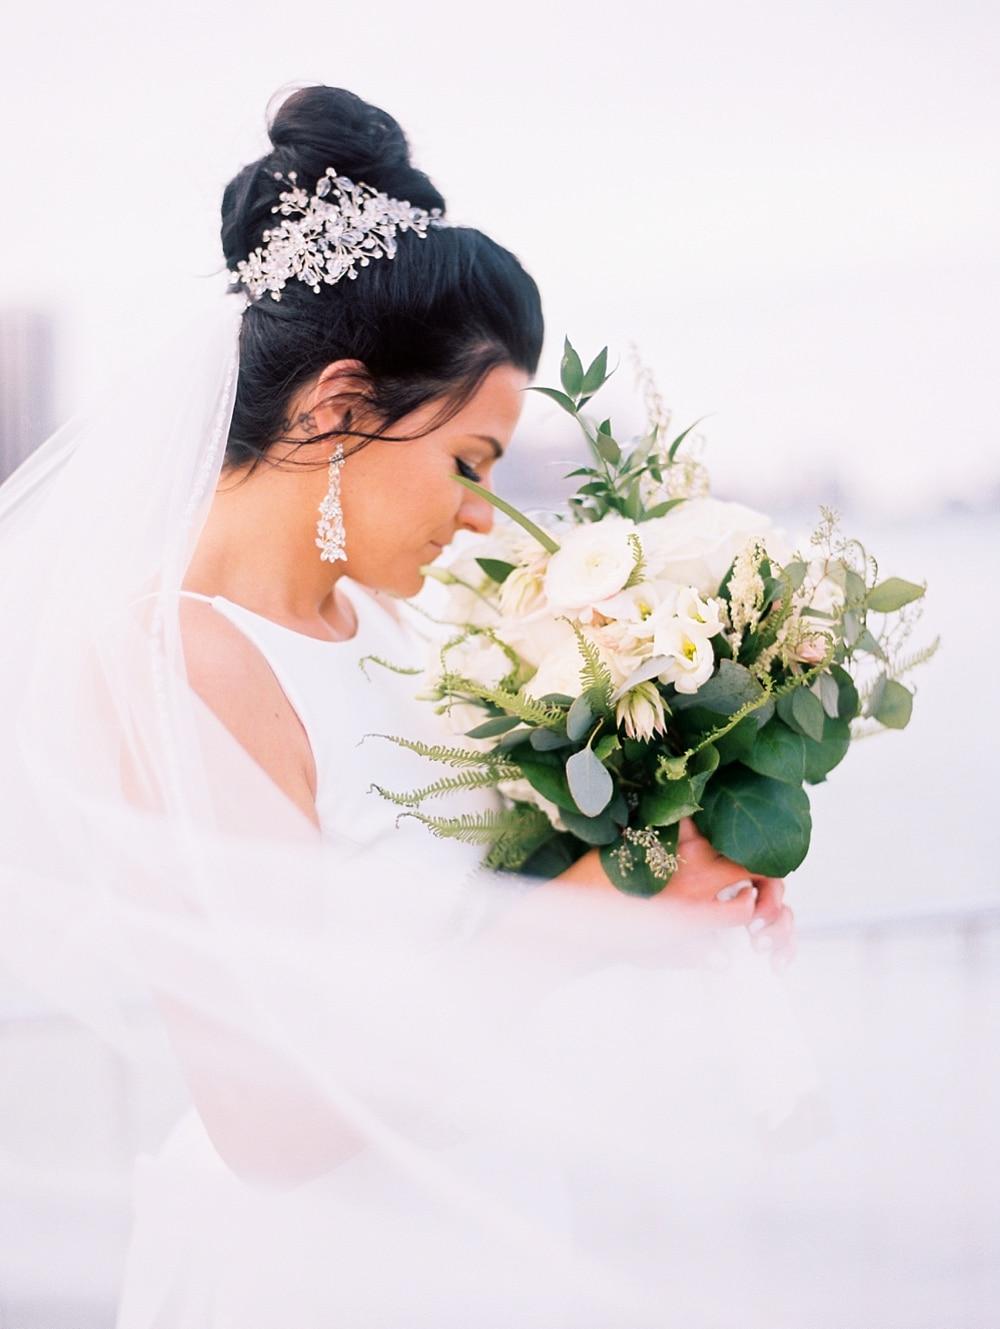 Kristin-La-Voie-Photography-chicago-wedding-photographer-54